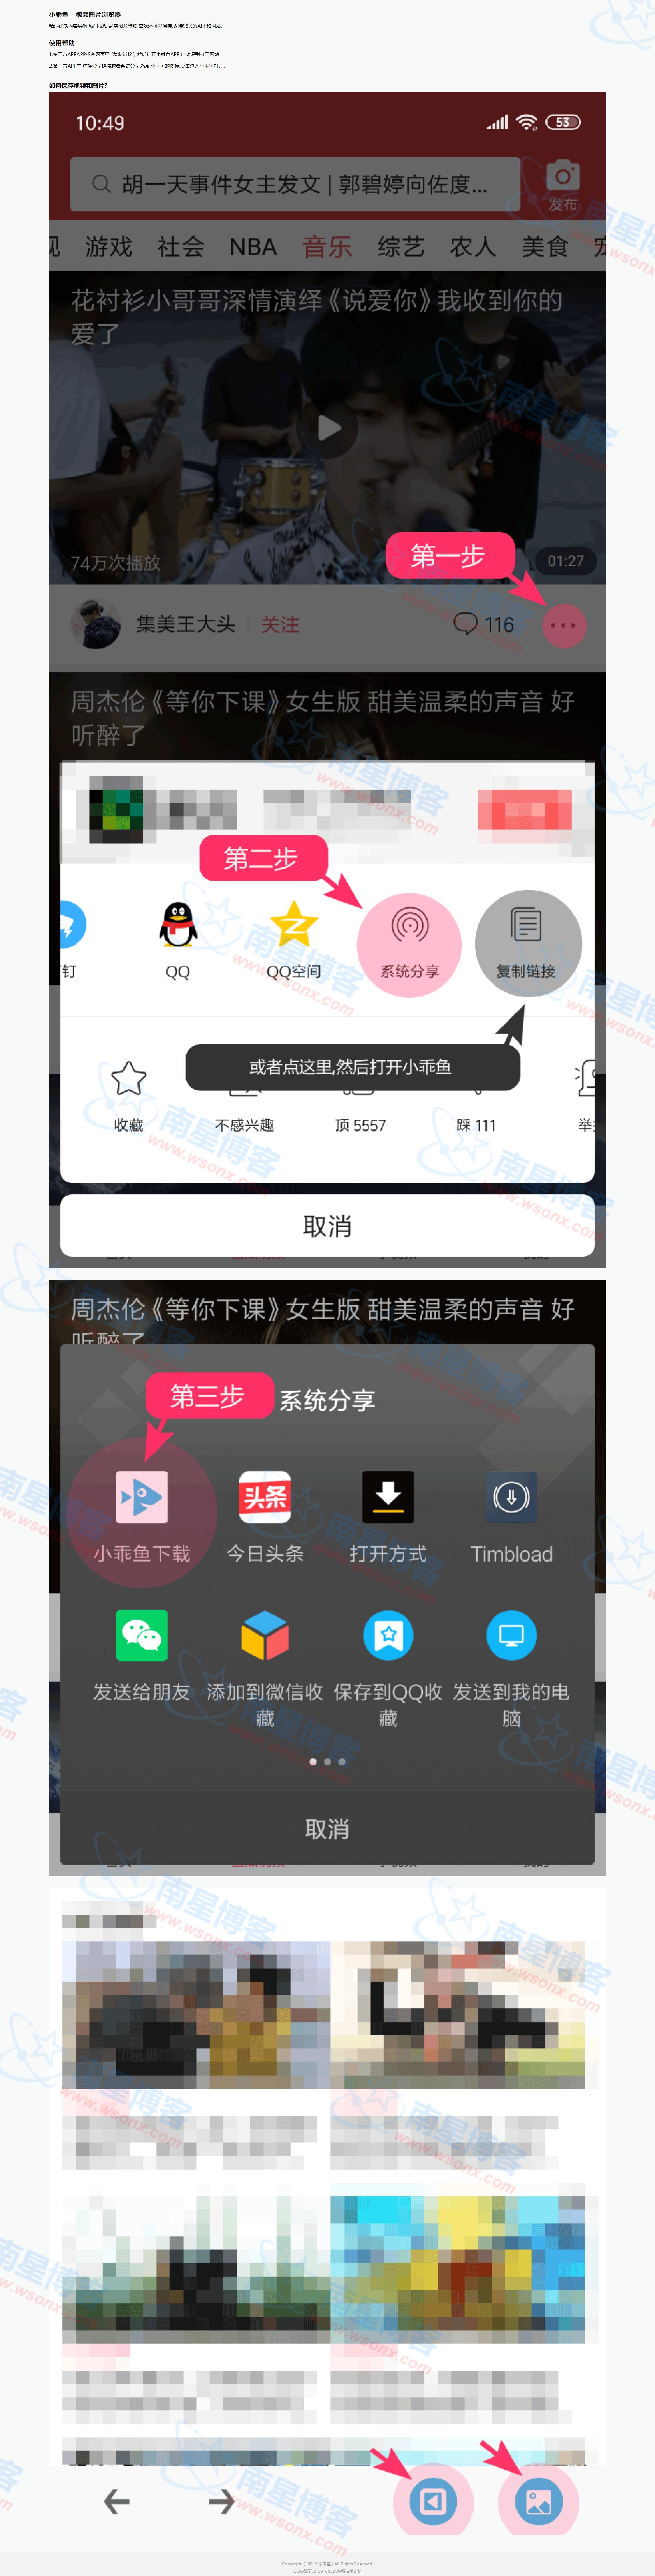 [Android]小乖鱼App 下载B站、抖音、微博、头条等视频图片